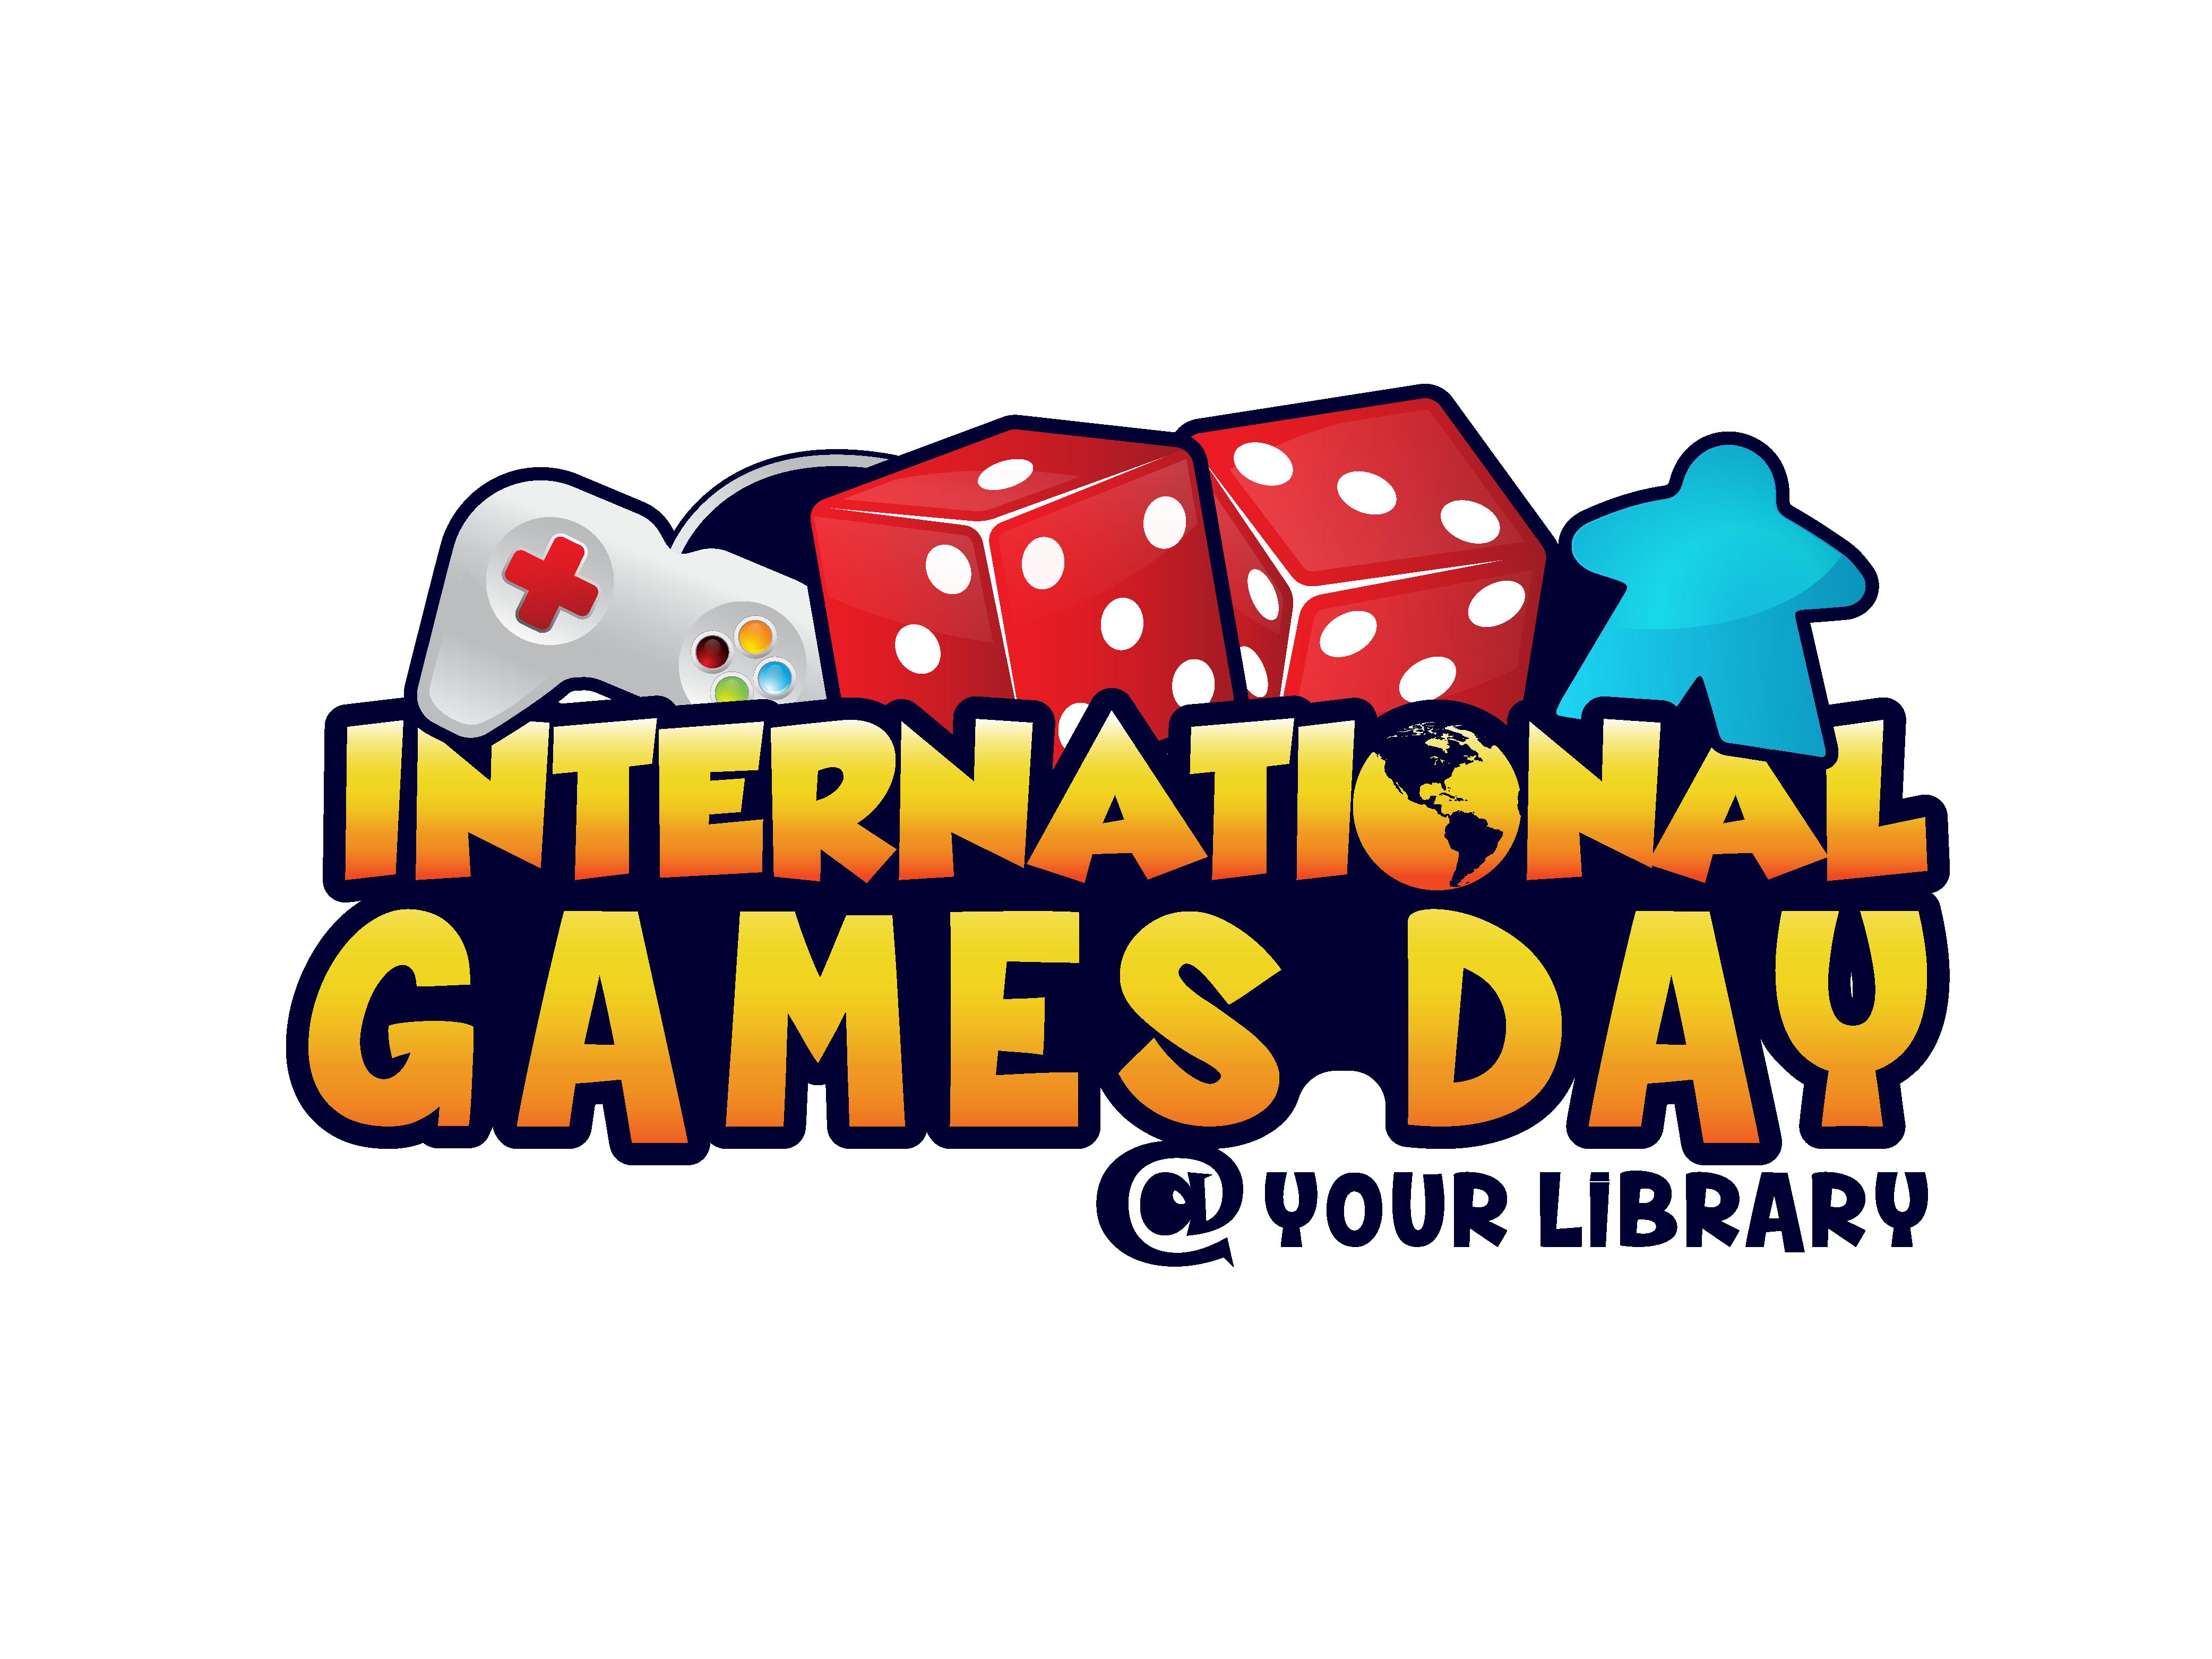 international games day 2016 focuses on bringing in big